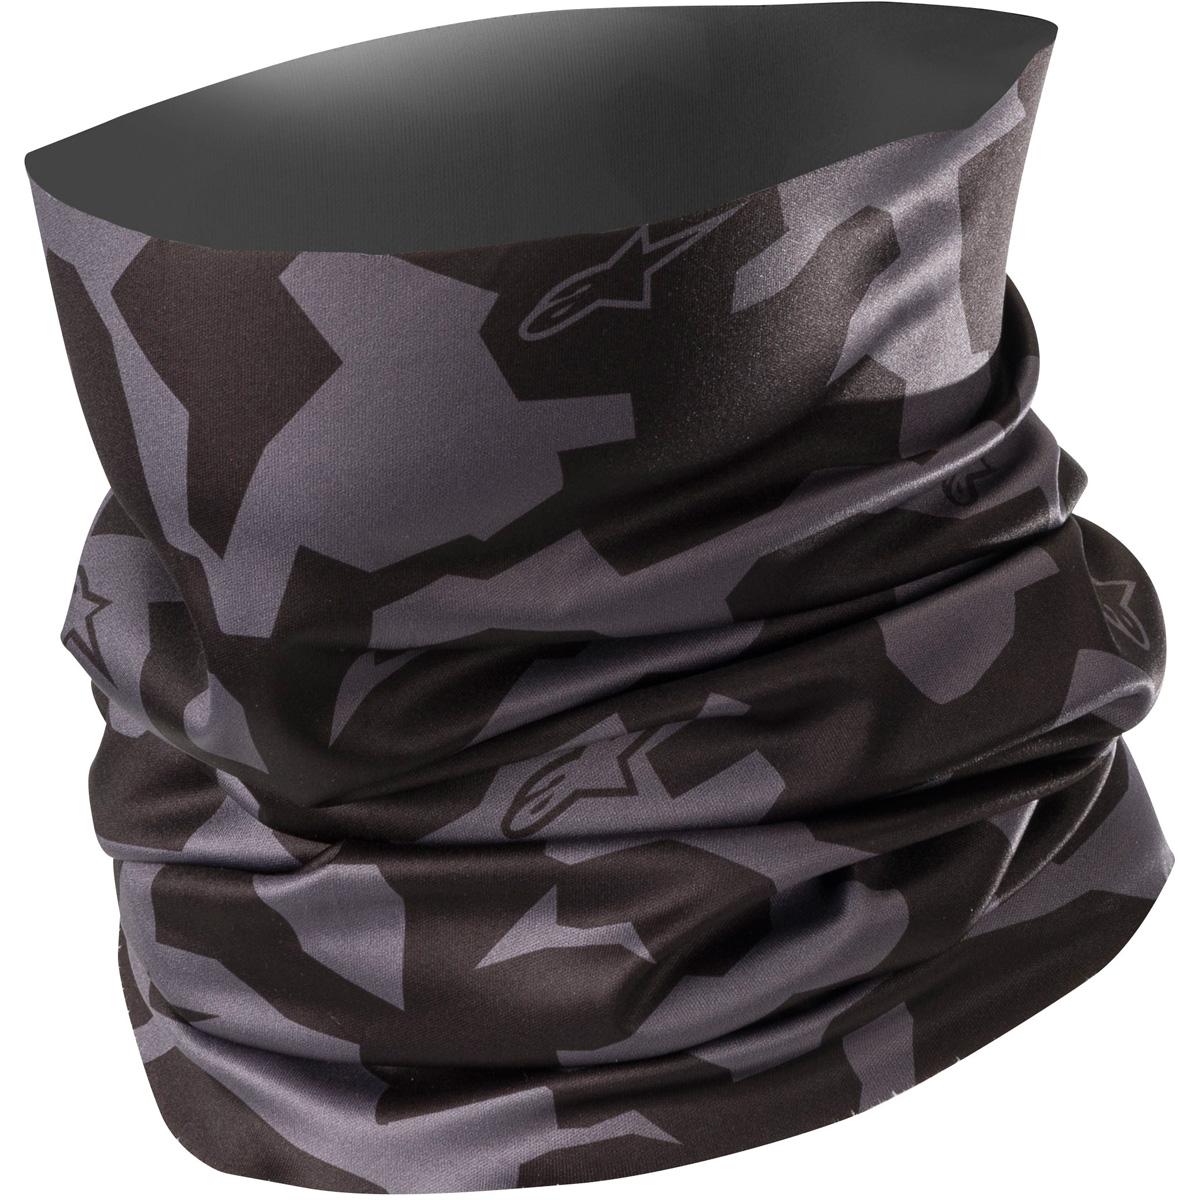 Térmico ALPINESTARS Camo Black / Anthracite